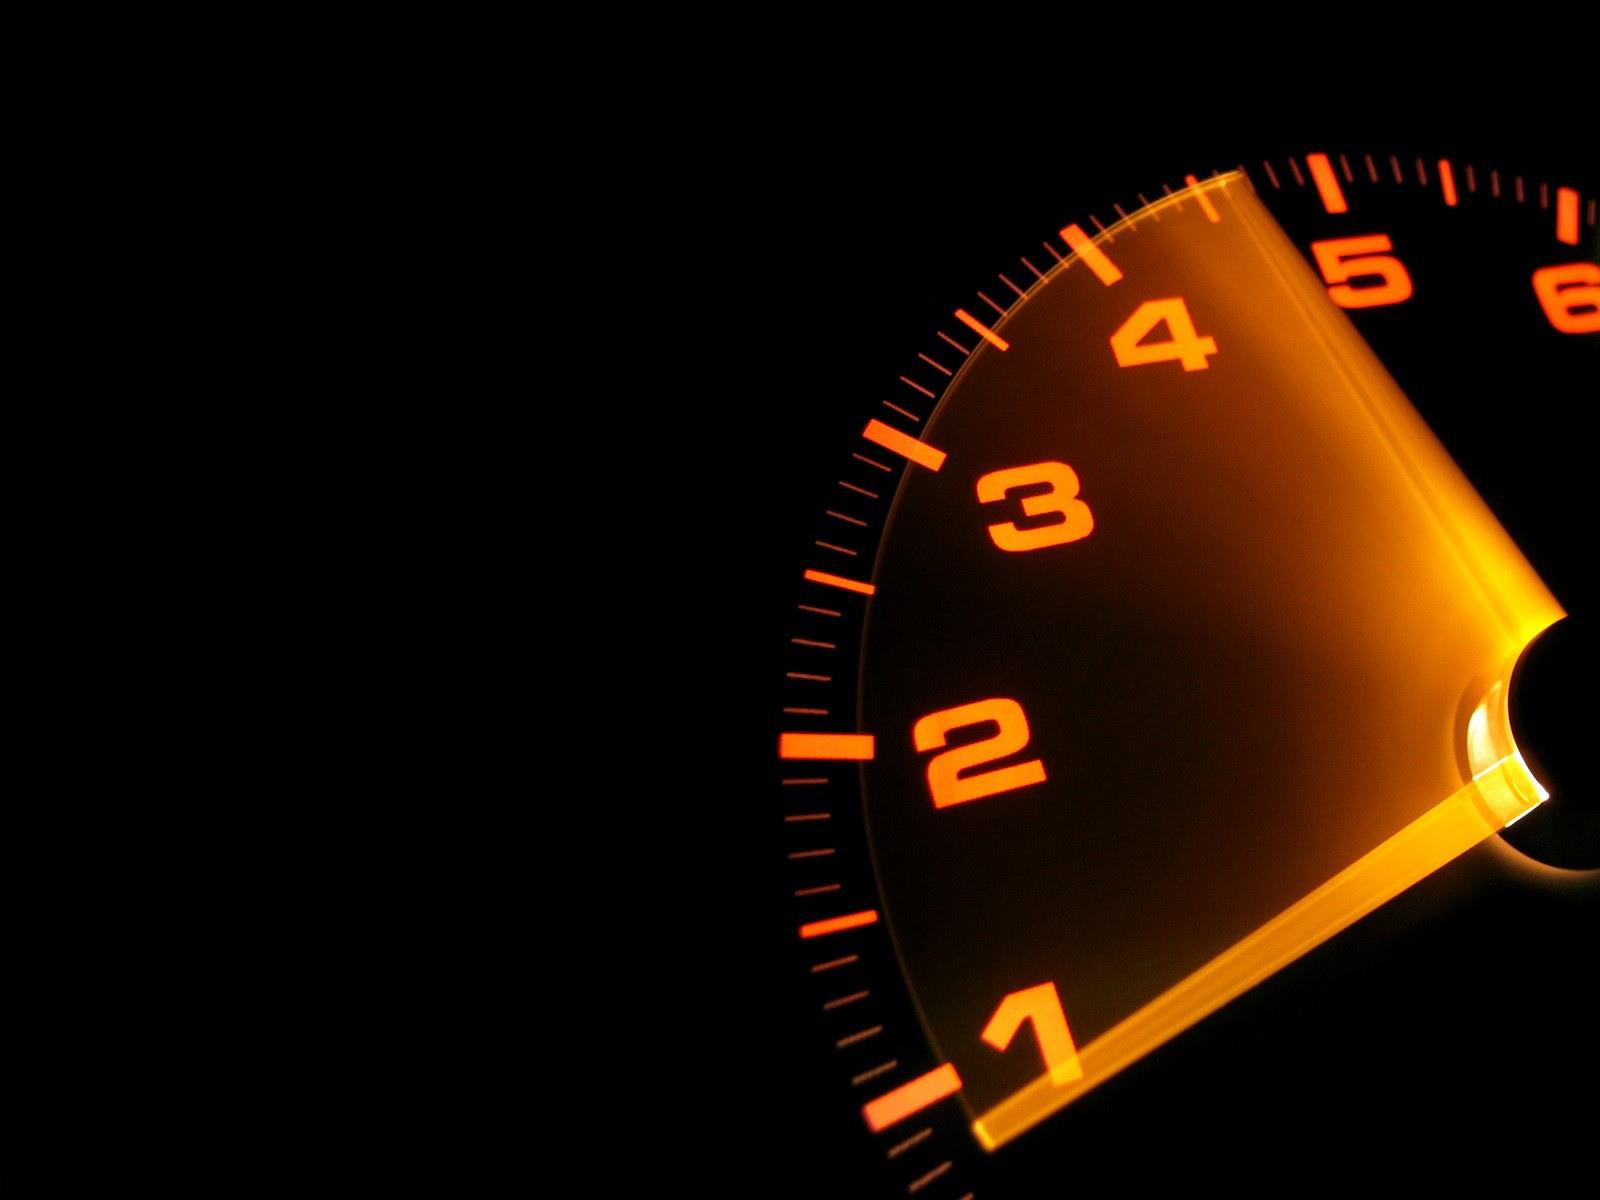 View Speed Cars Wallpaper - View Speed Cars Wallpaper